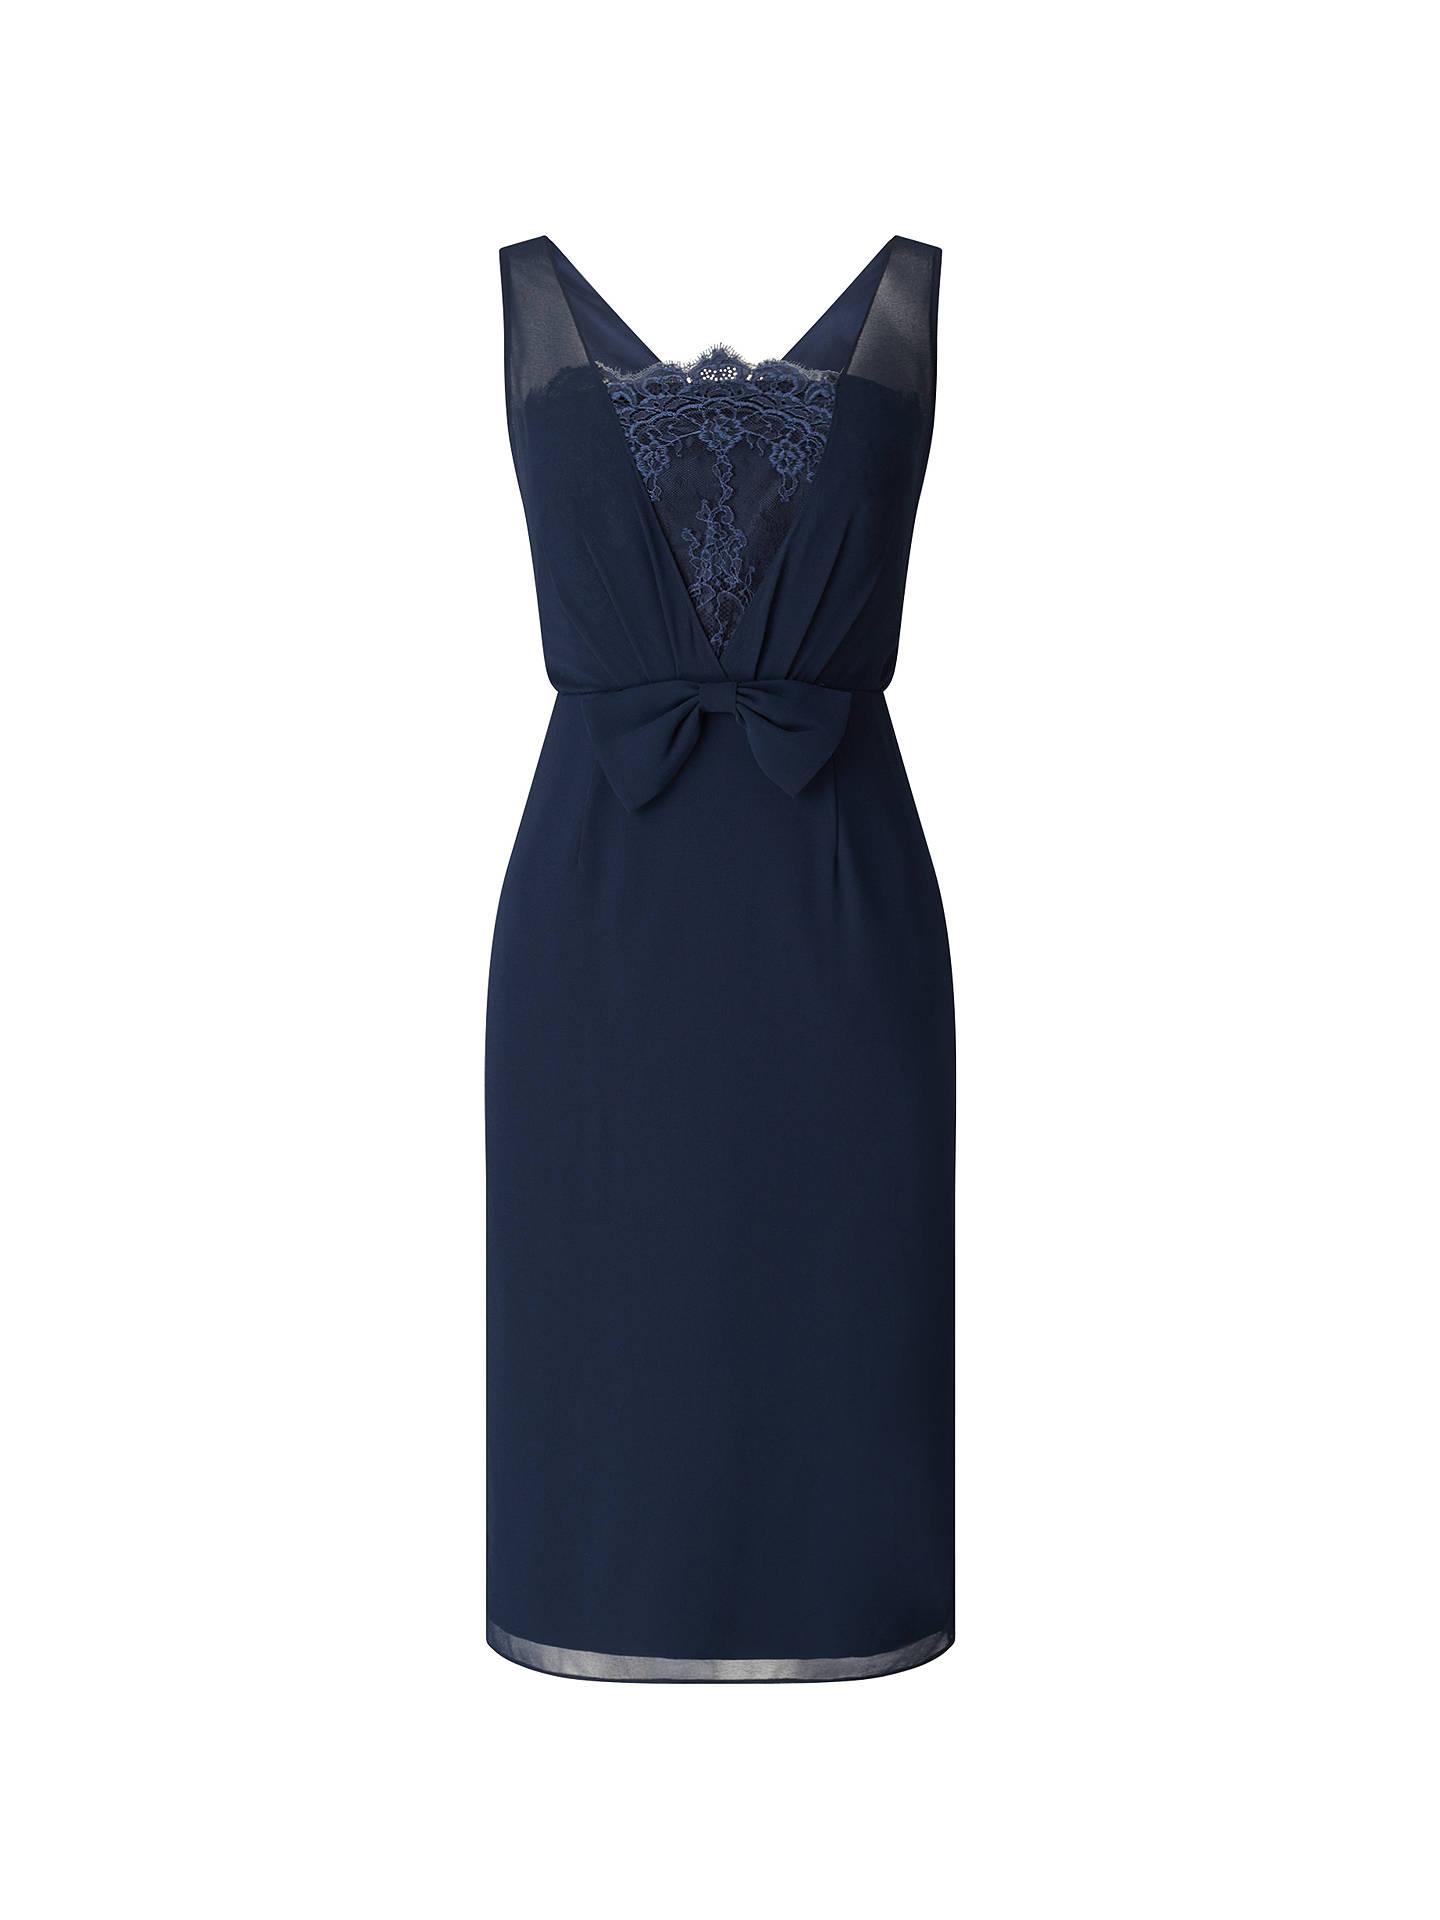 aa99070dbb6f ... Buy Jacques Vert Chiffon Lace Trim Dress, Navy, 8 Online at  johnlewis.com